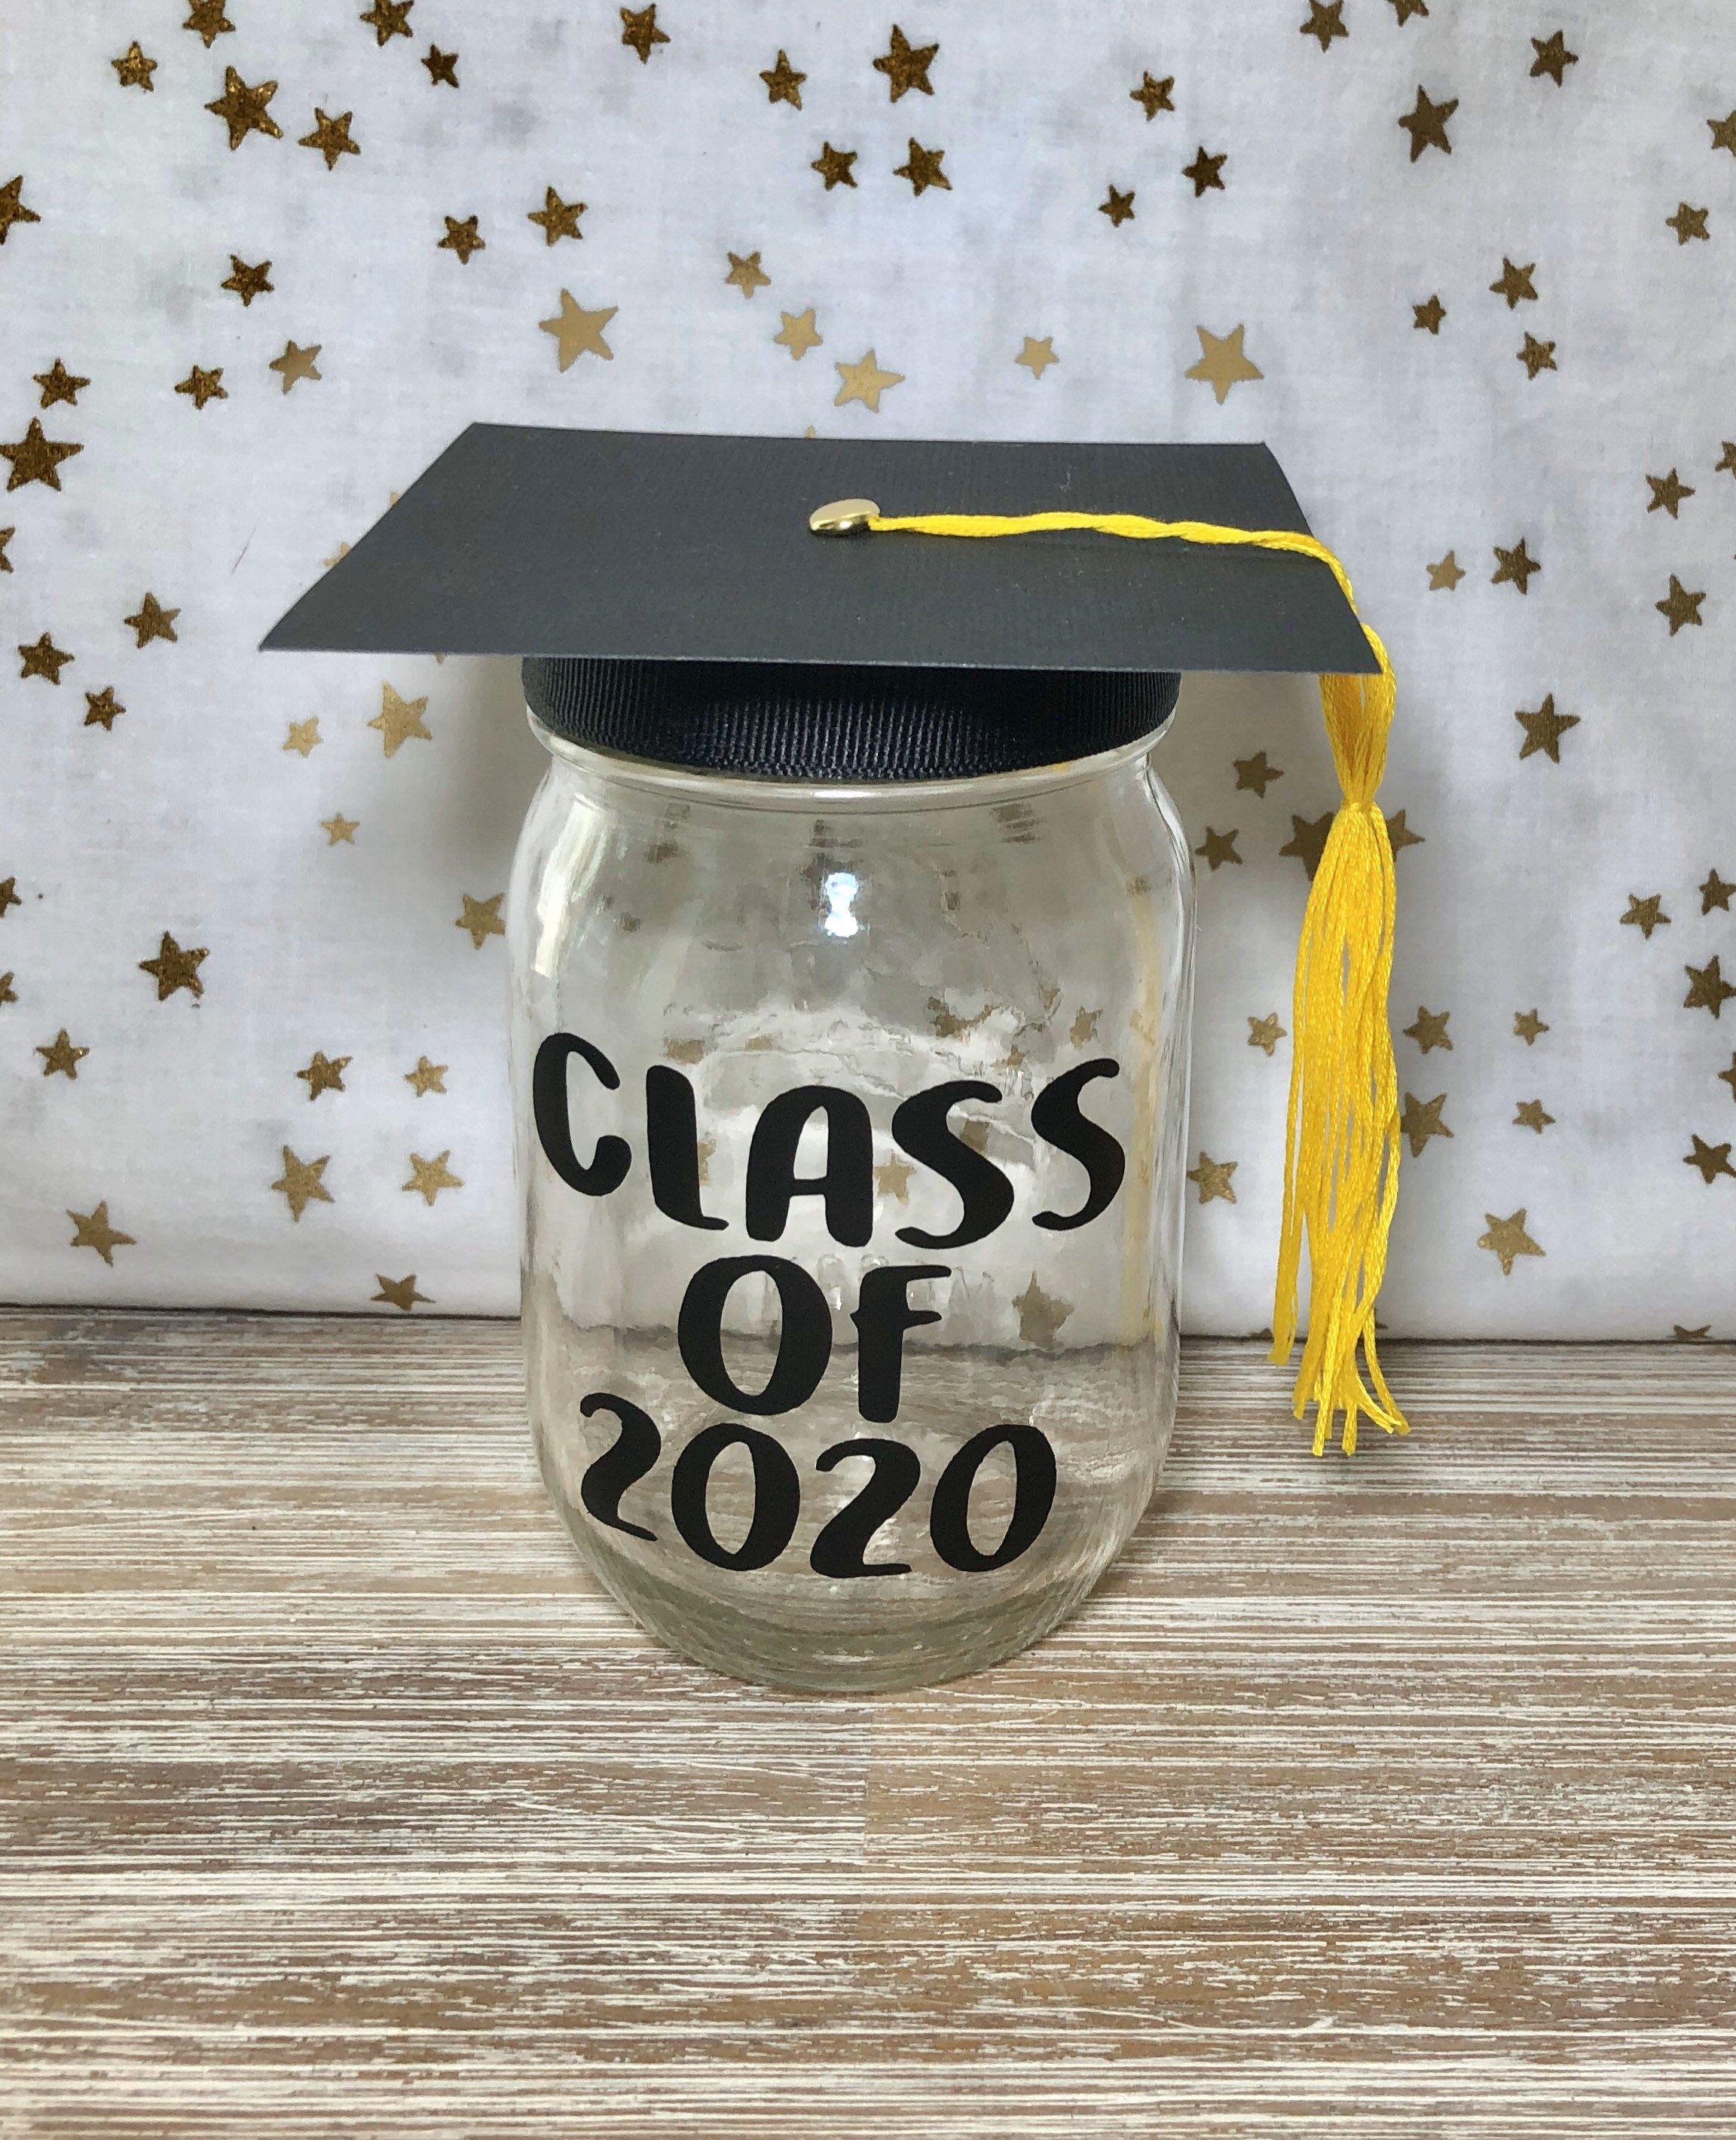 Class Of 2021 Graduation Gift And Party Decoration Mason Jar Etsy Graduation Center Pieces Graduation Gifts High School Graduation Gifts